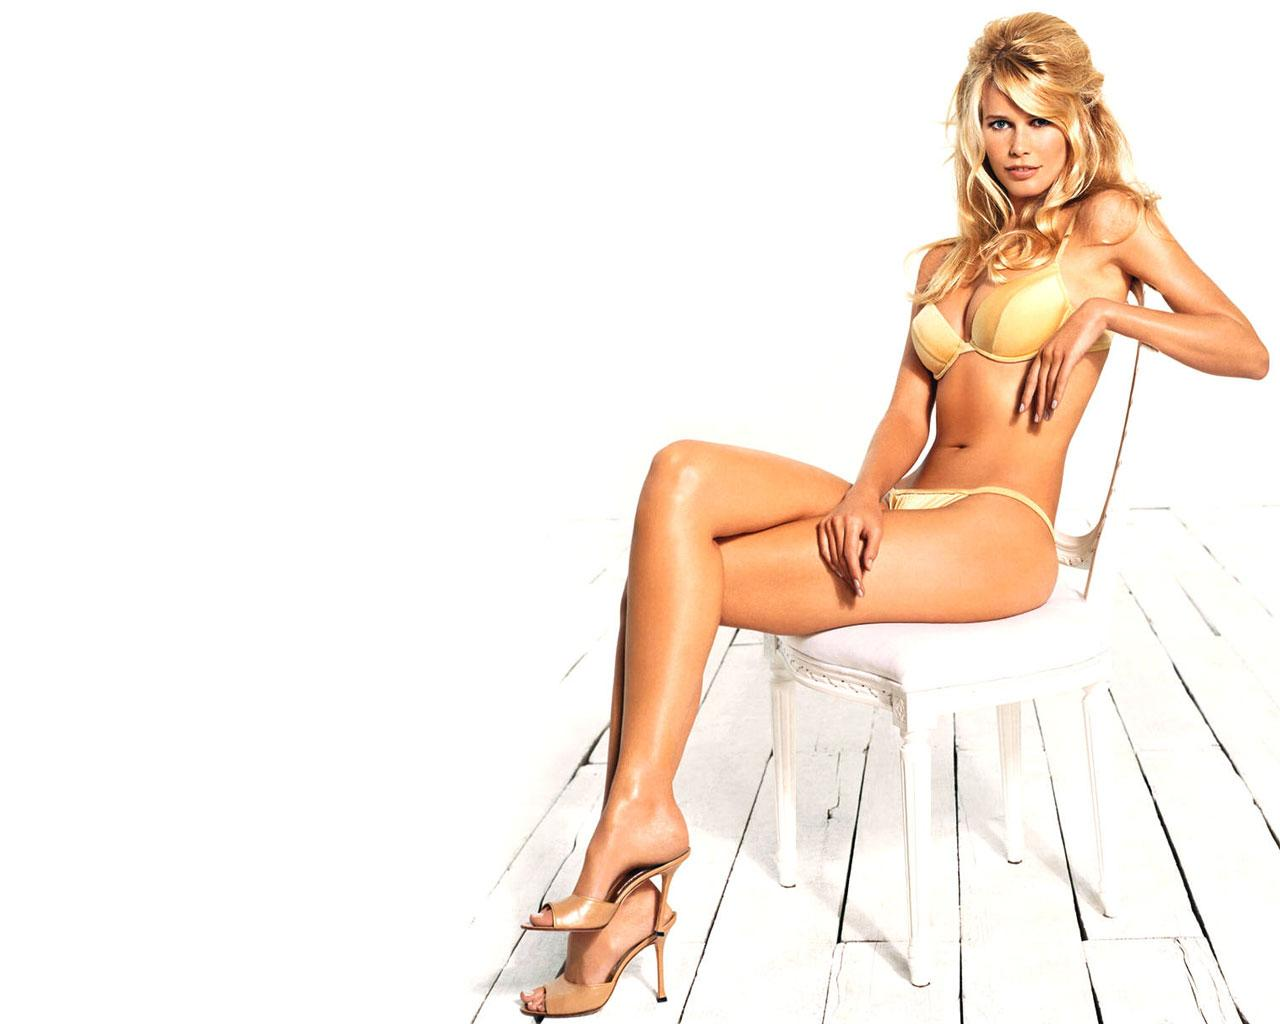 best looking woman   claudia schiffer   1280x1024 wallpaper 4